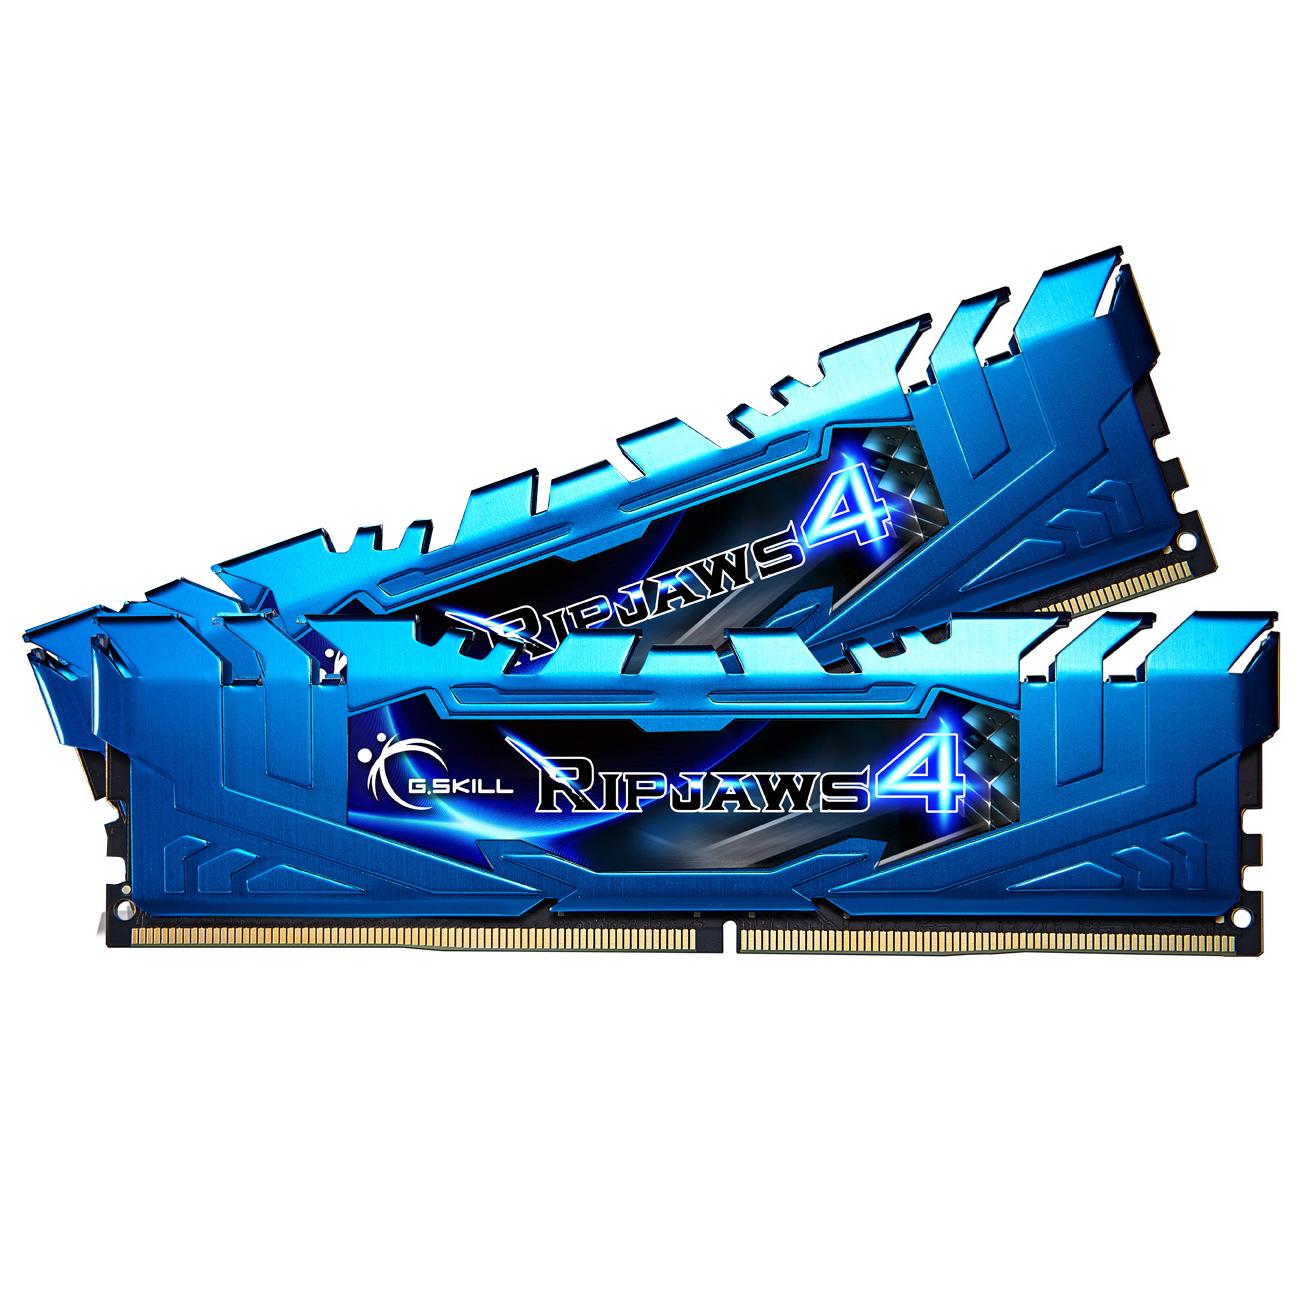 Mémoire PC G.Skill RipJaws 4 Series Bleu 16 Go (2x 8 Go) DDR4 3000 MHz CL15 Kit Dual Channel 2 barrettes de RAM DDR4 PC4-24000 - F4-3000C15D-16GRBB